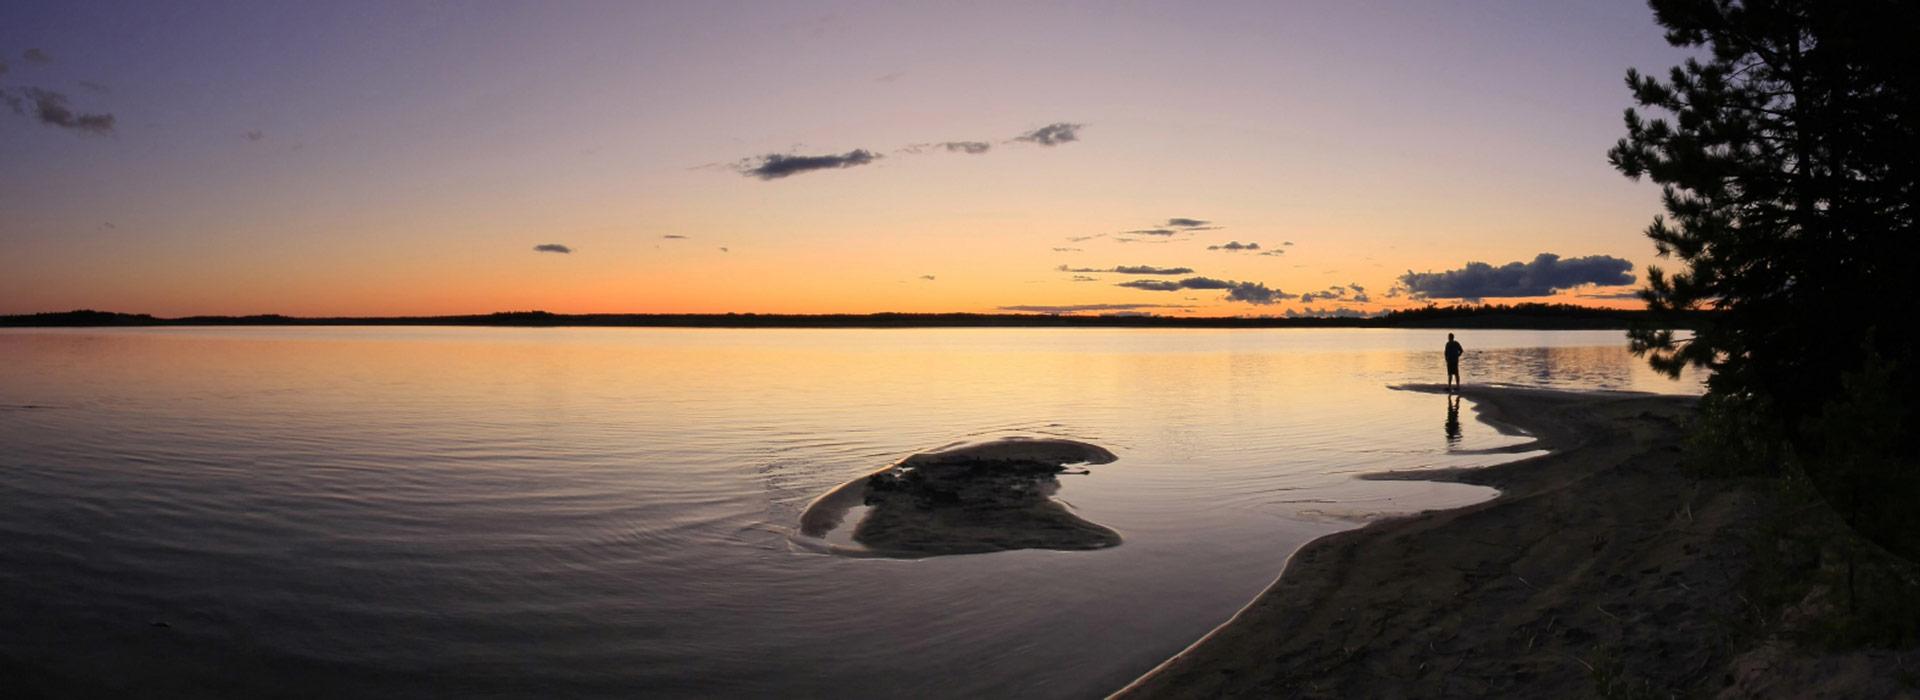 ivanhoe-lake-provincial-park